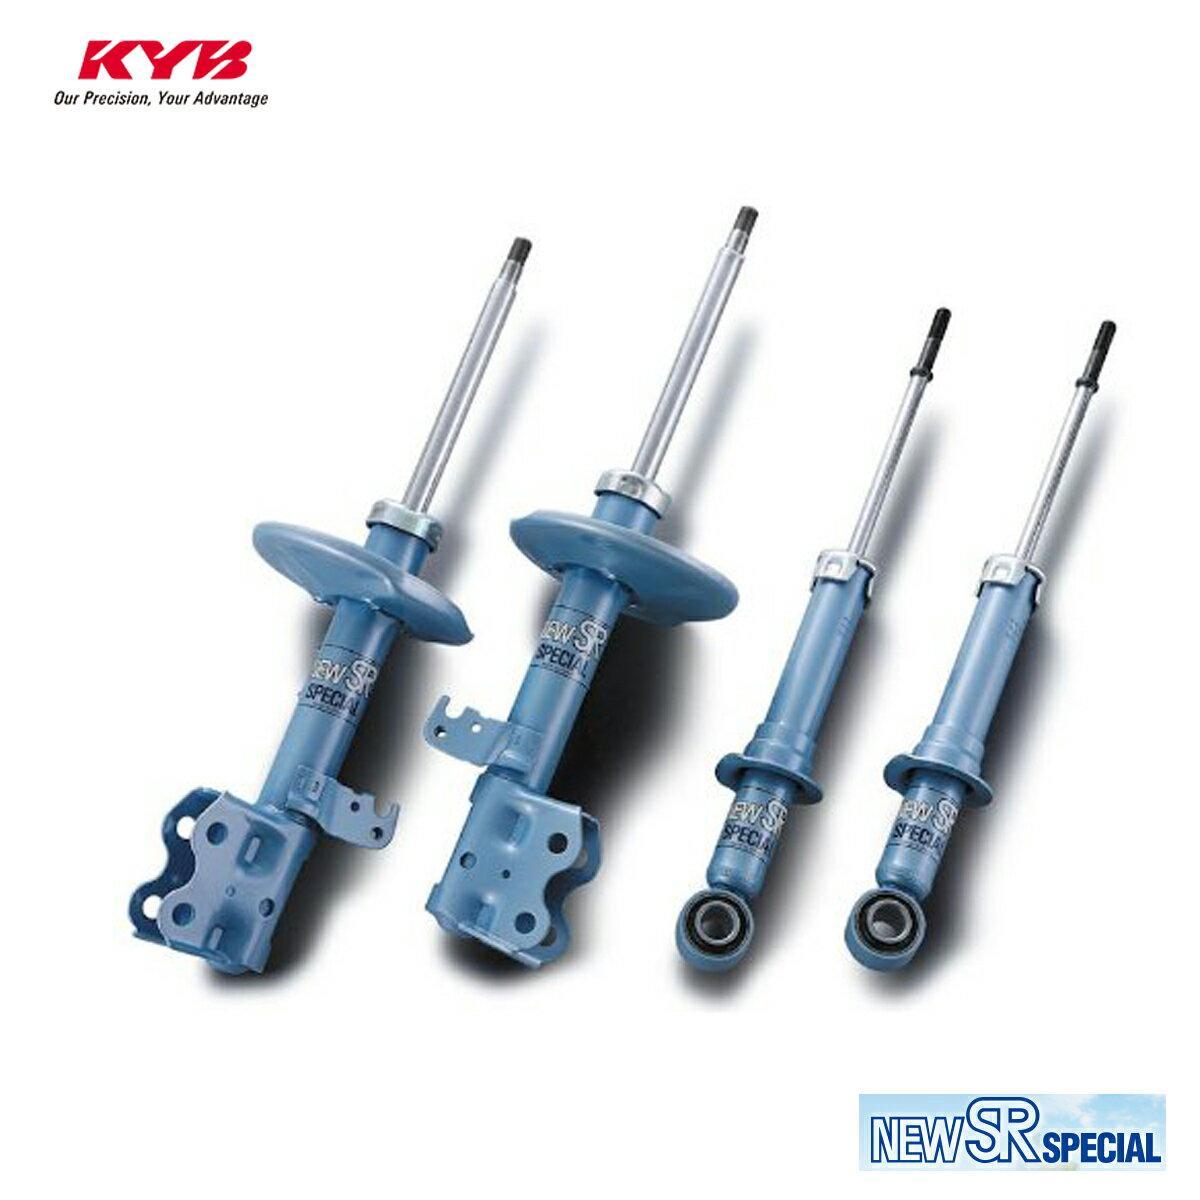 KYB カヤバ RVR N64WG ショックアブソーバー フロント 左用 1本 NEW SR SPECIAL NST5320L 配送先条件有り